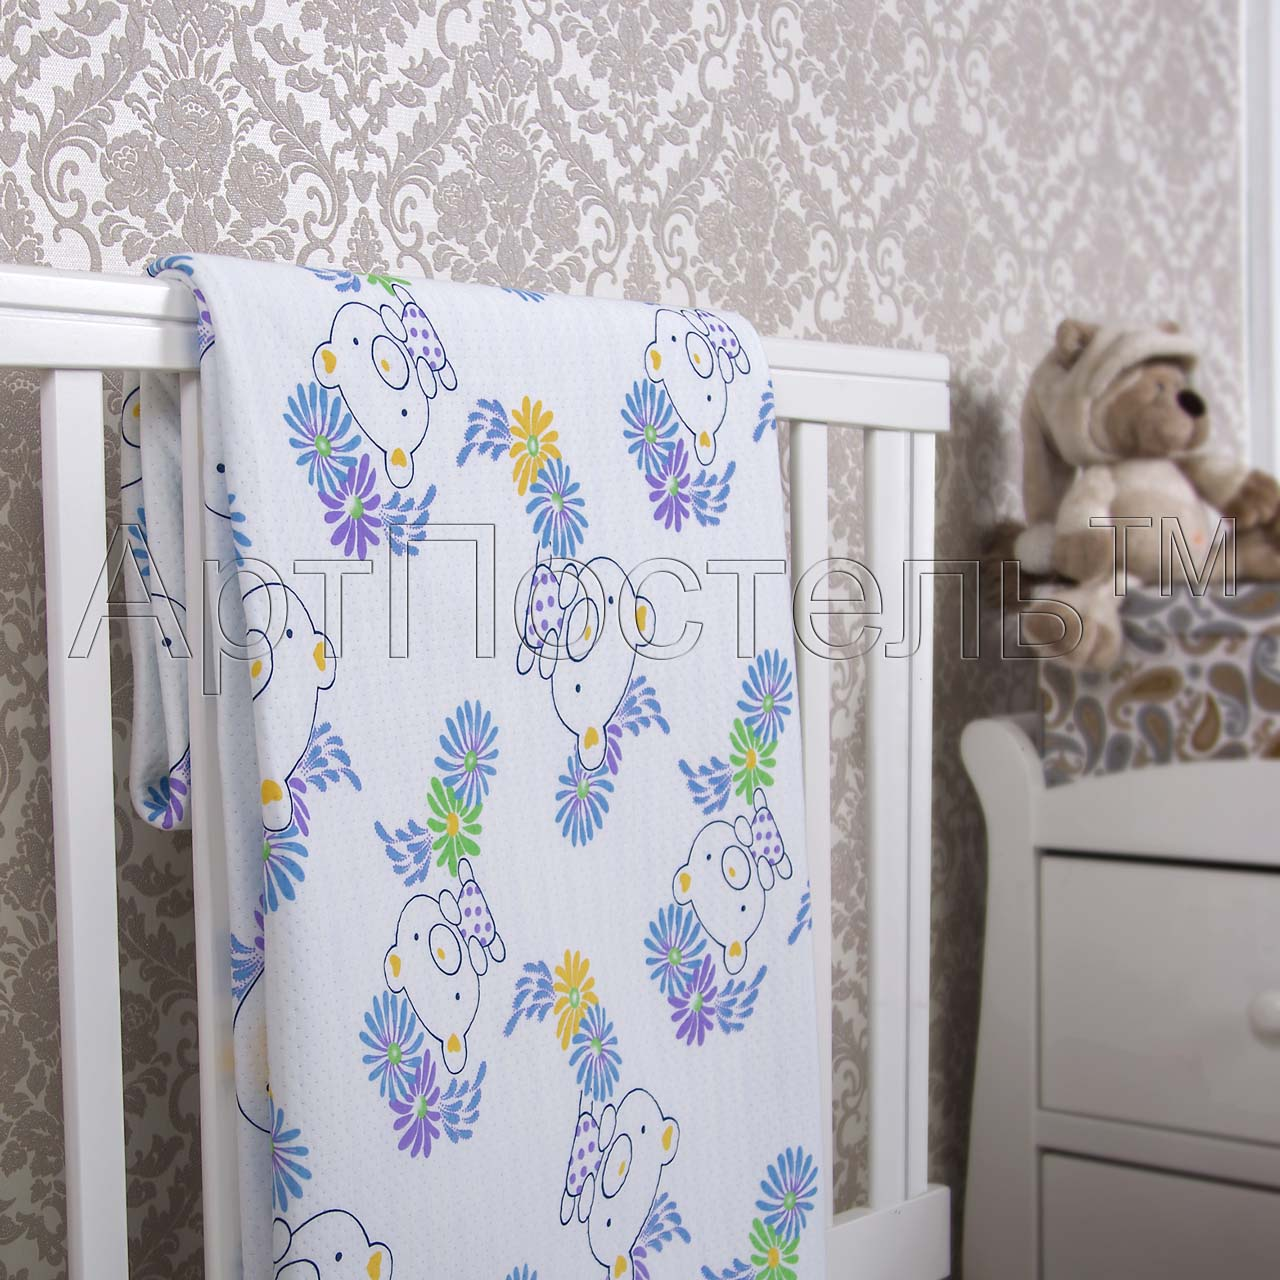 Покрывало  Топтыжка  р. 140х200 - Текстиль для дома артикул: 33973